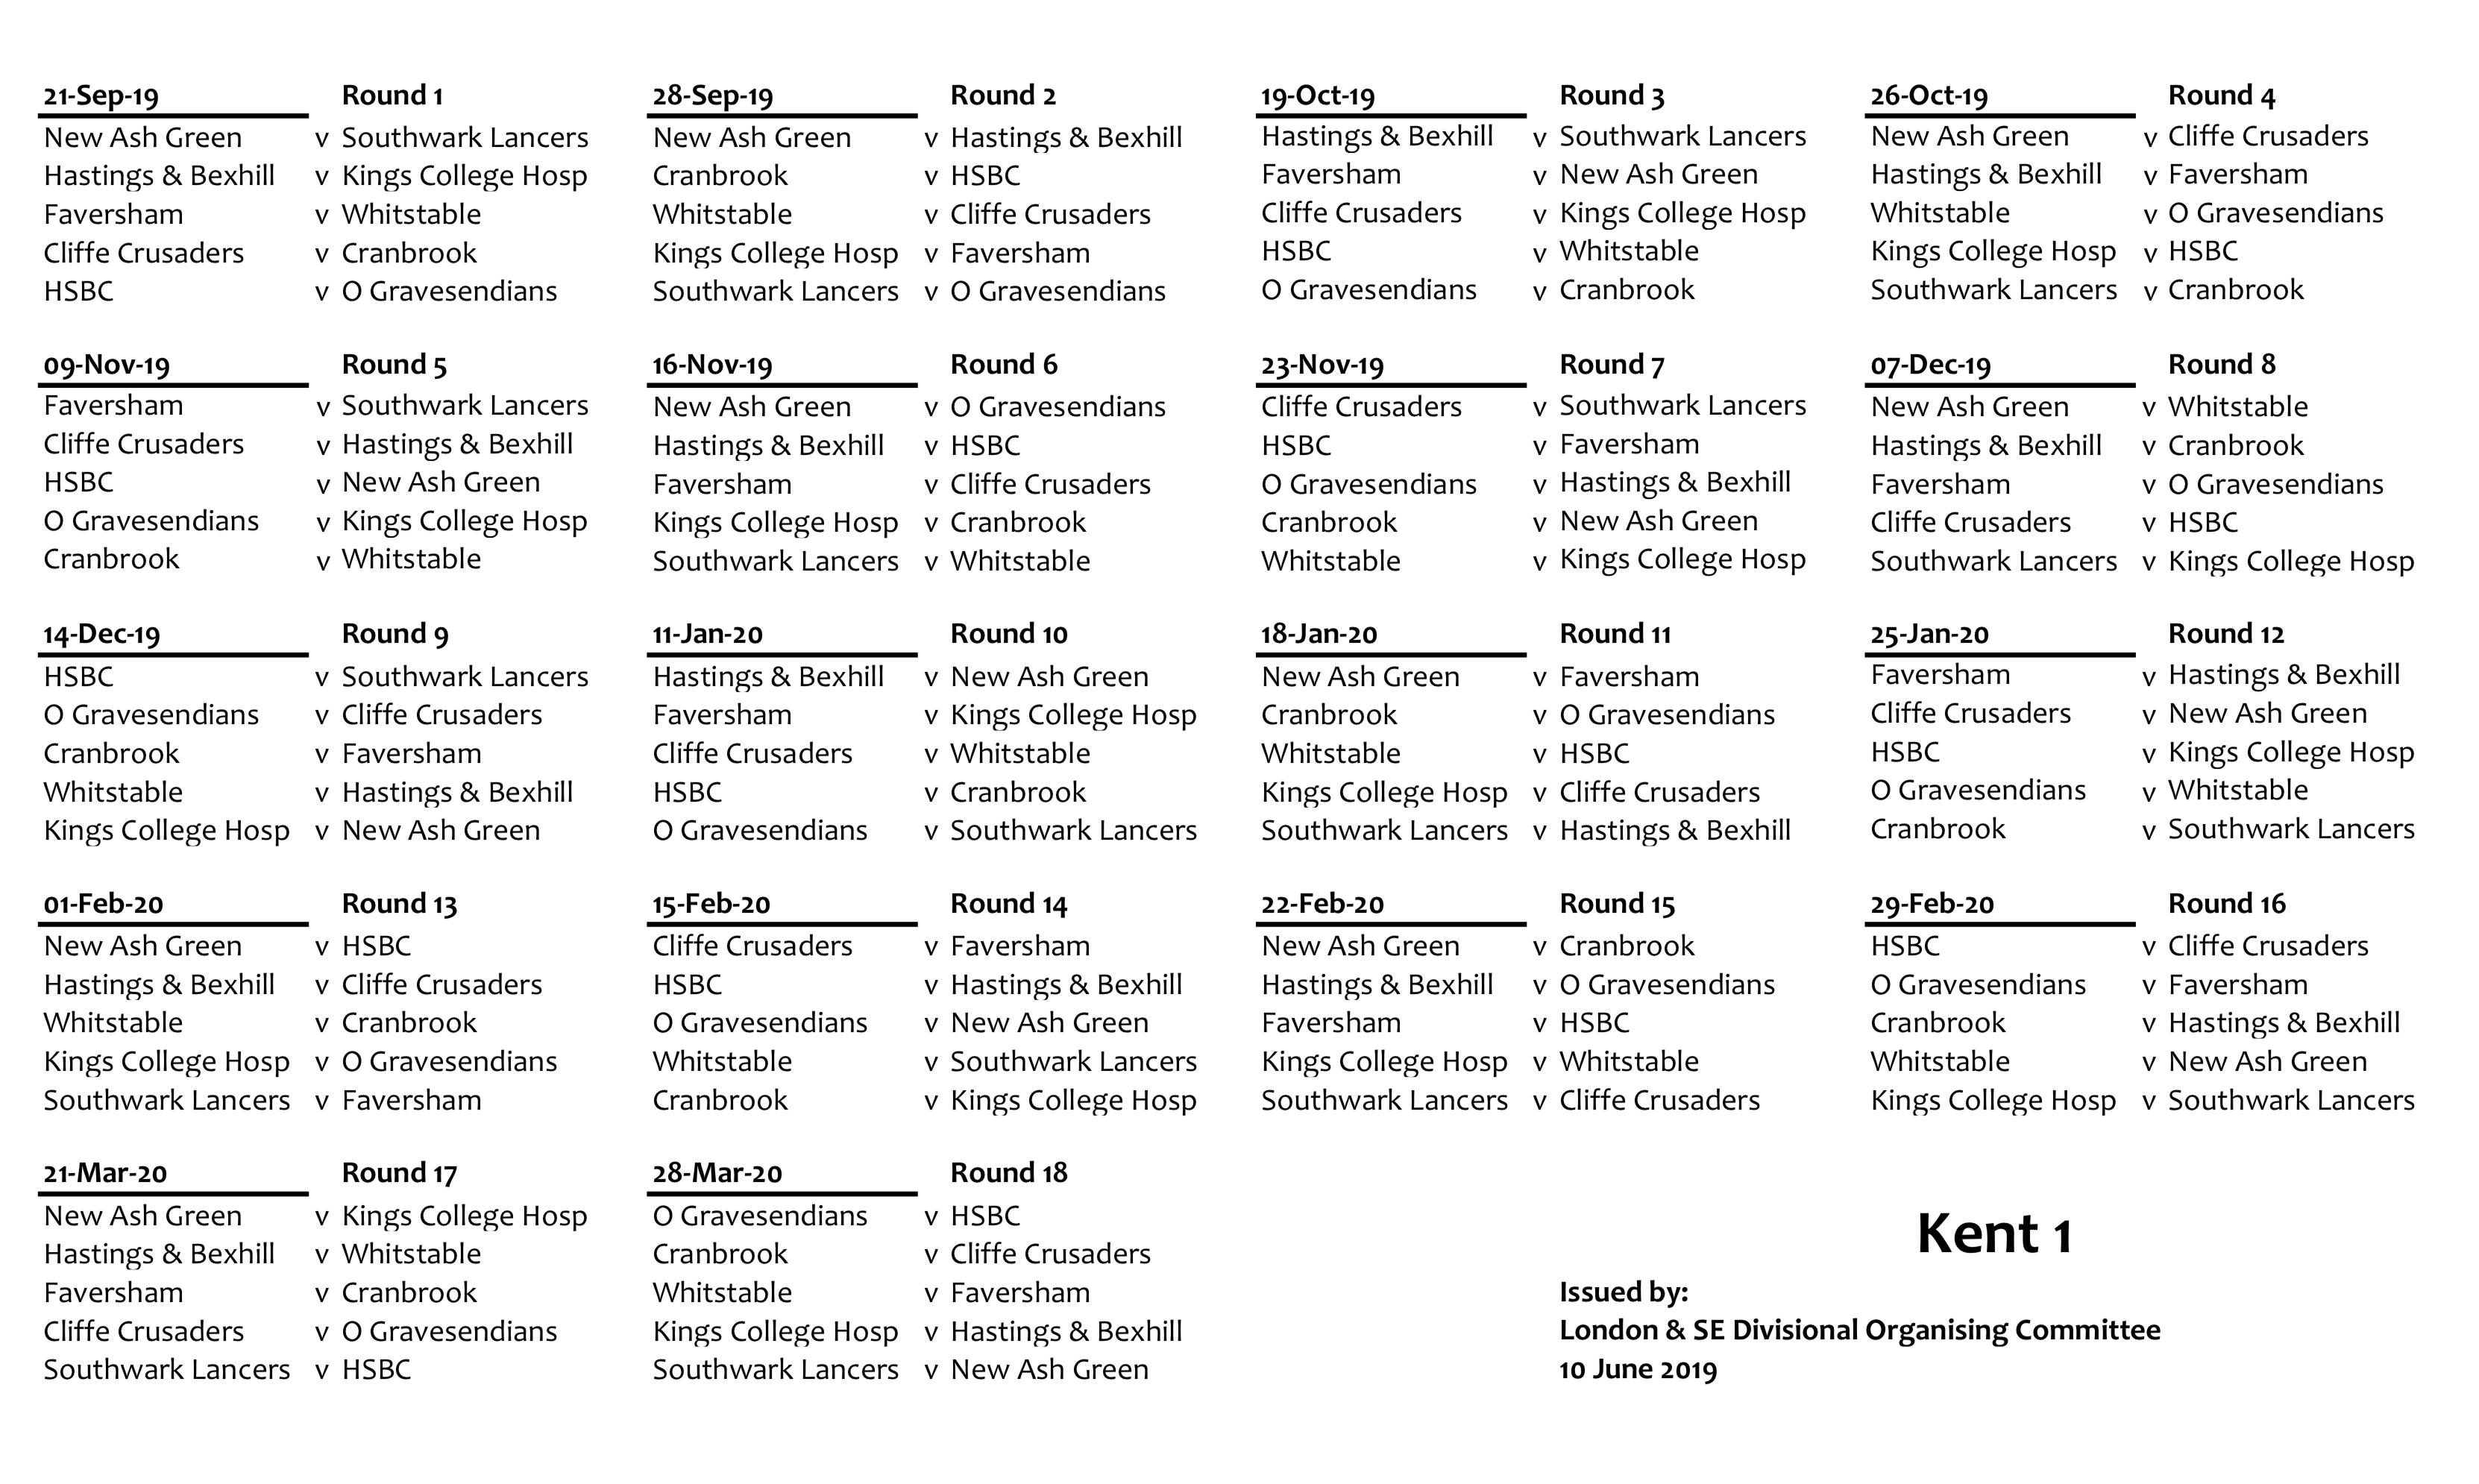 Kent County RFU » RFU Leagues in Kent